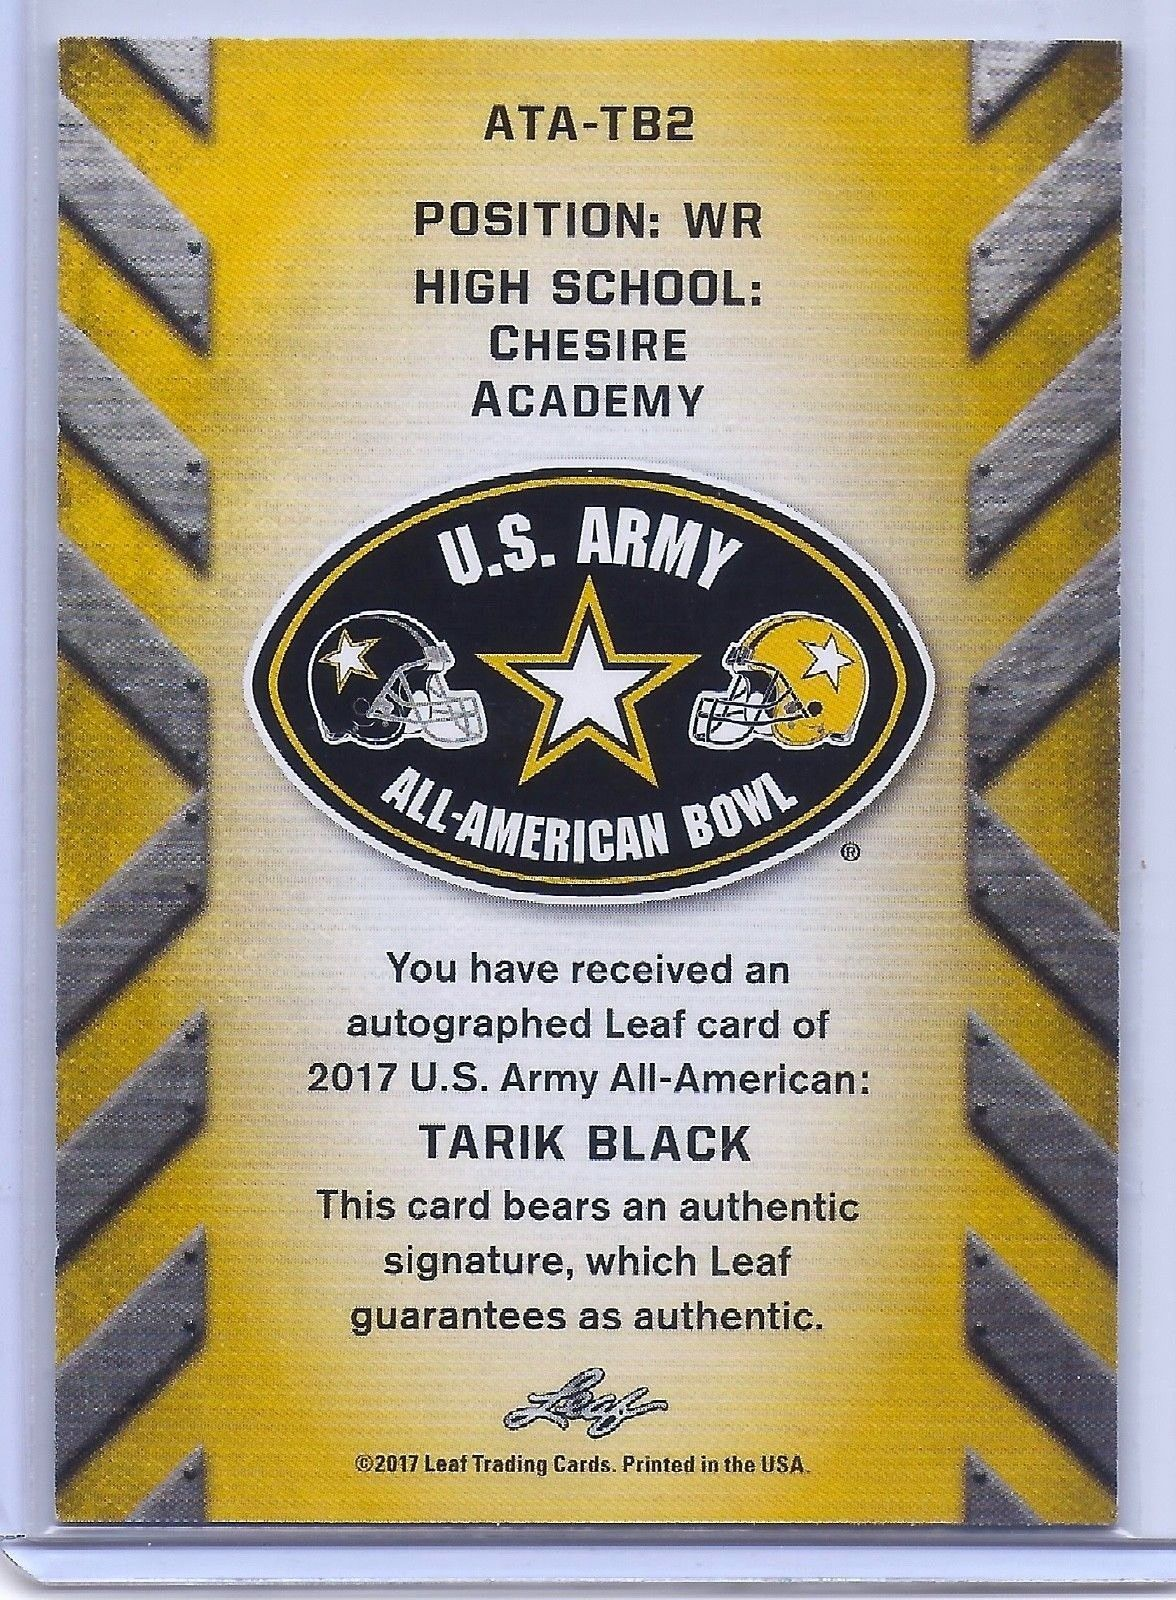 TARIK BLACK MICHIGAN WOLVERINES 2017 LEAF U.S. ARMY TOUR AUTOGRAPHED ROOKIE CARD